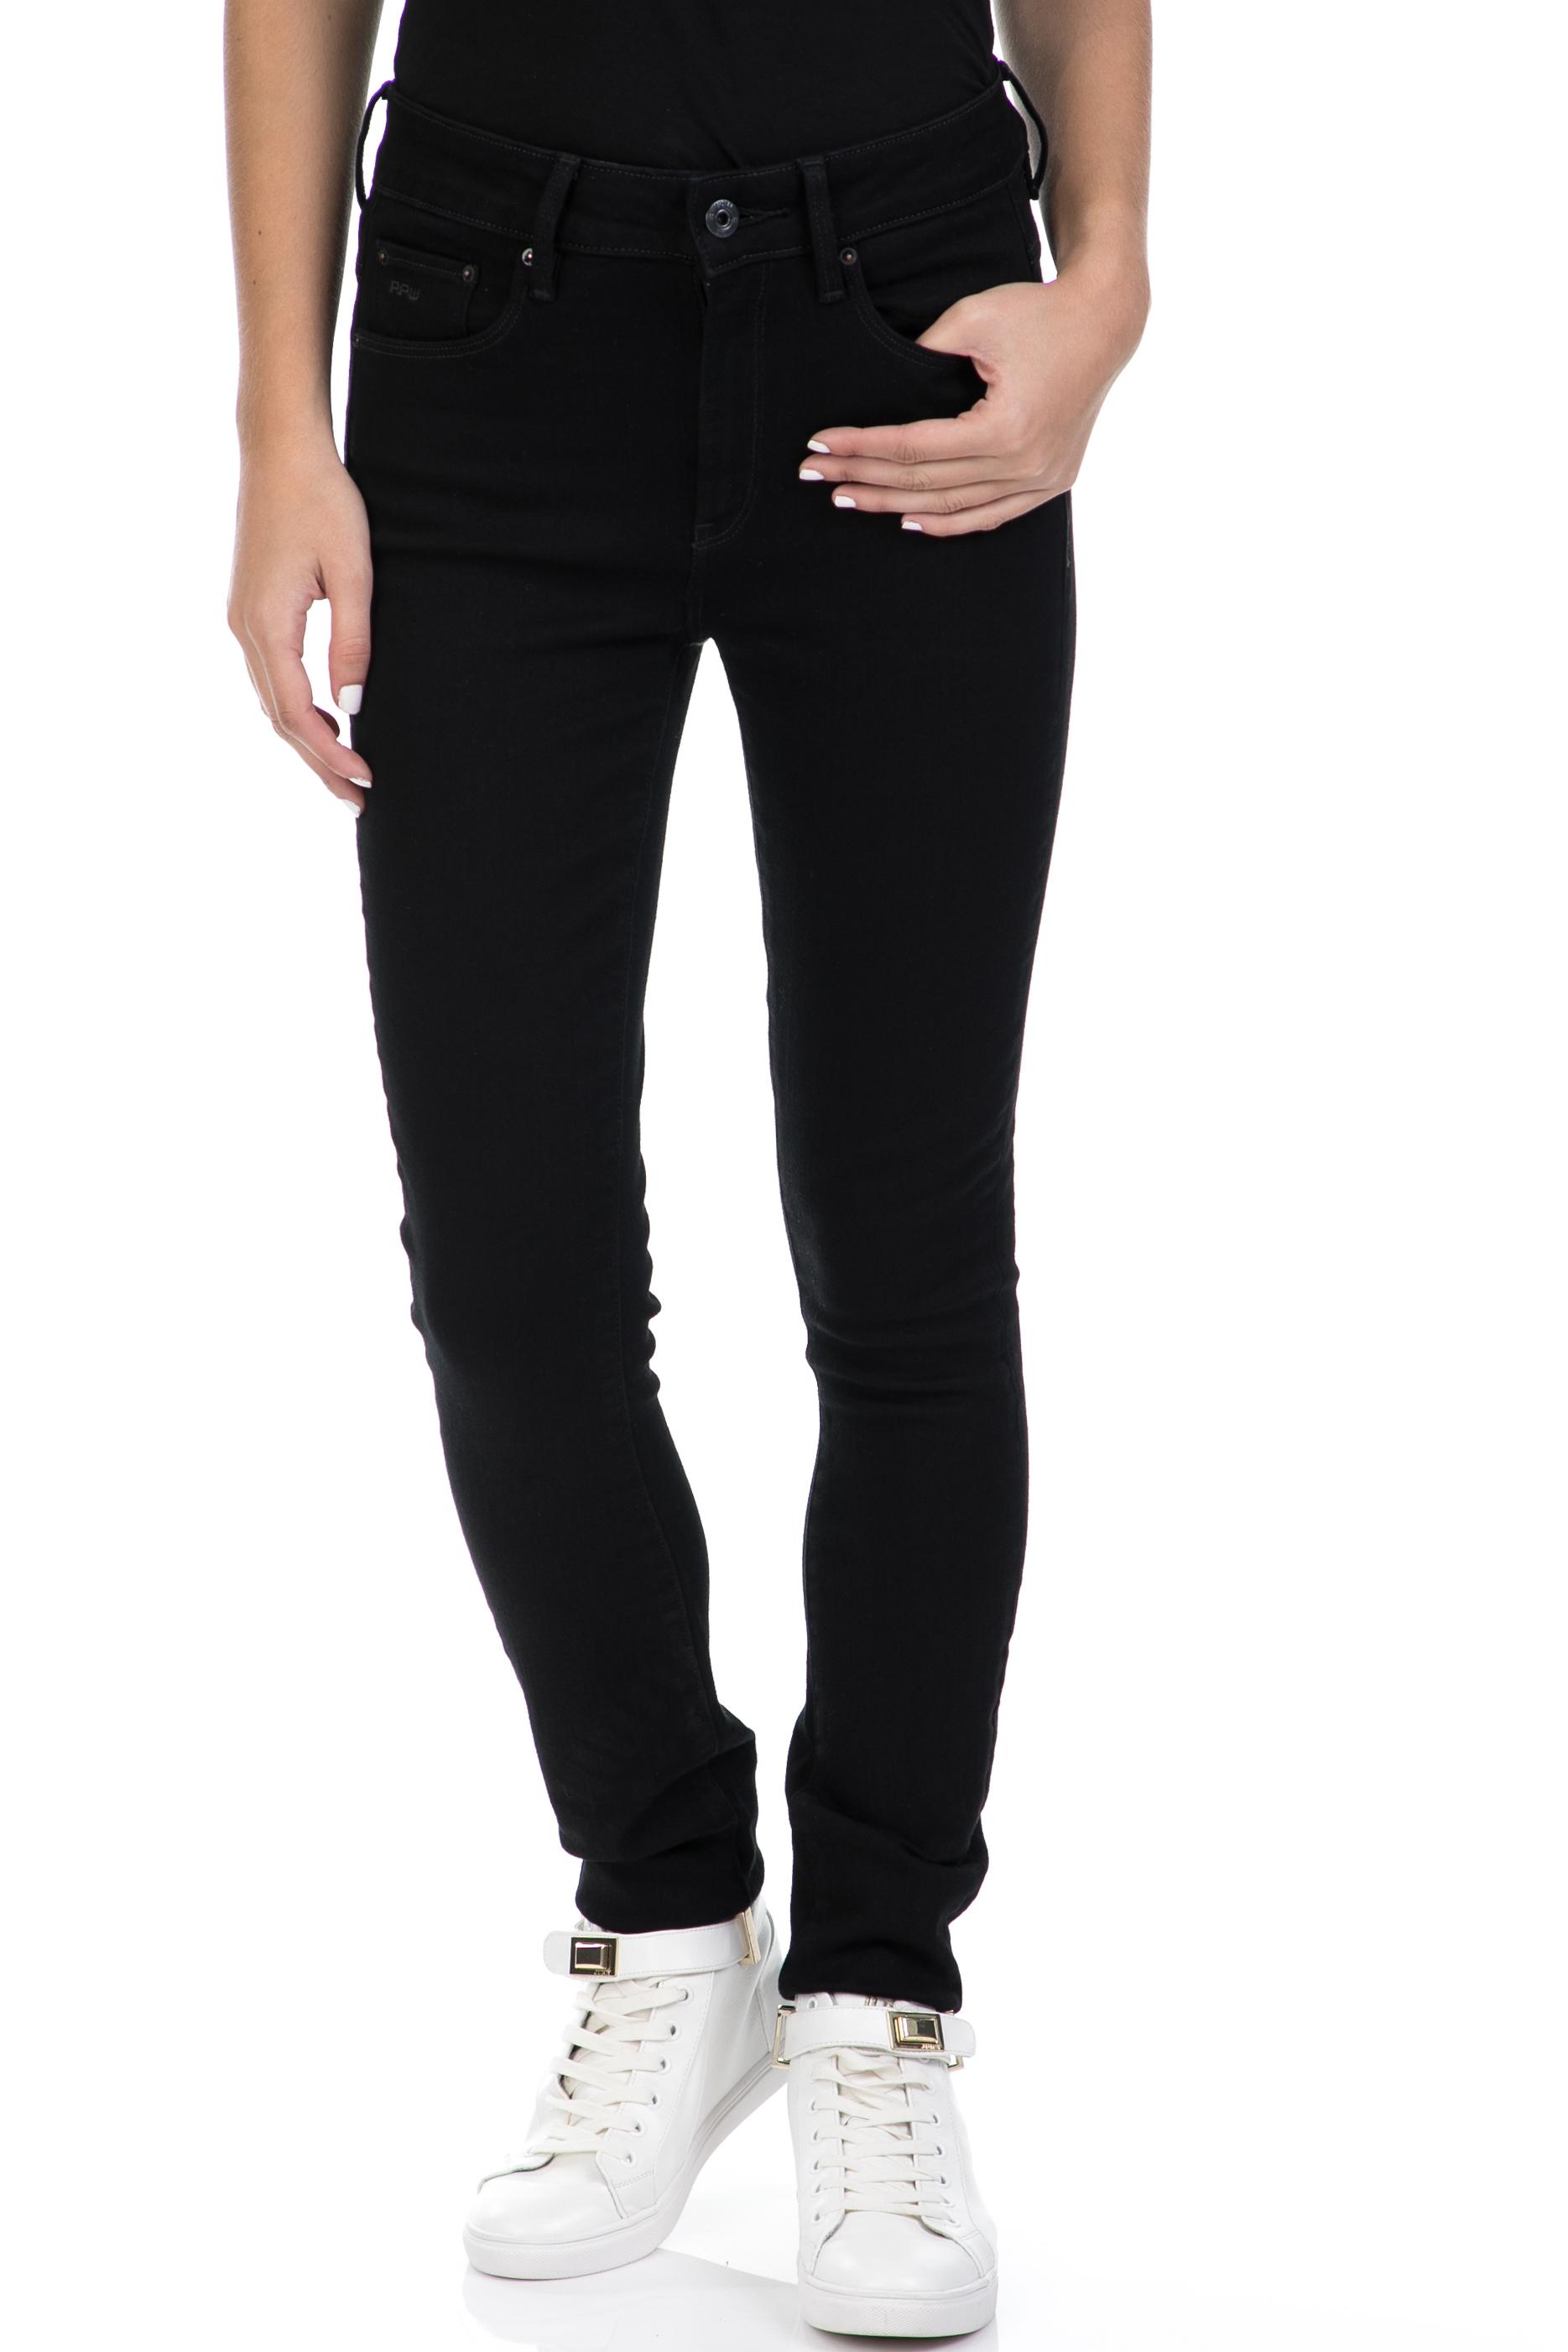 0b1dc69bdb4 G-STAR - Γυναικείο τζιν παντελόνι 3301 High Skinny μαύρο